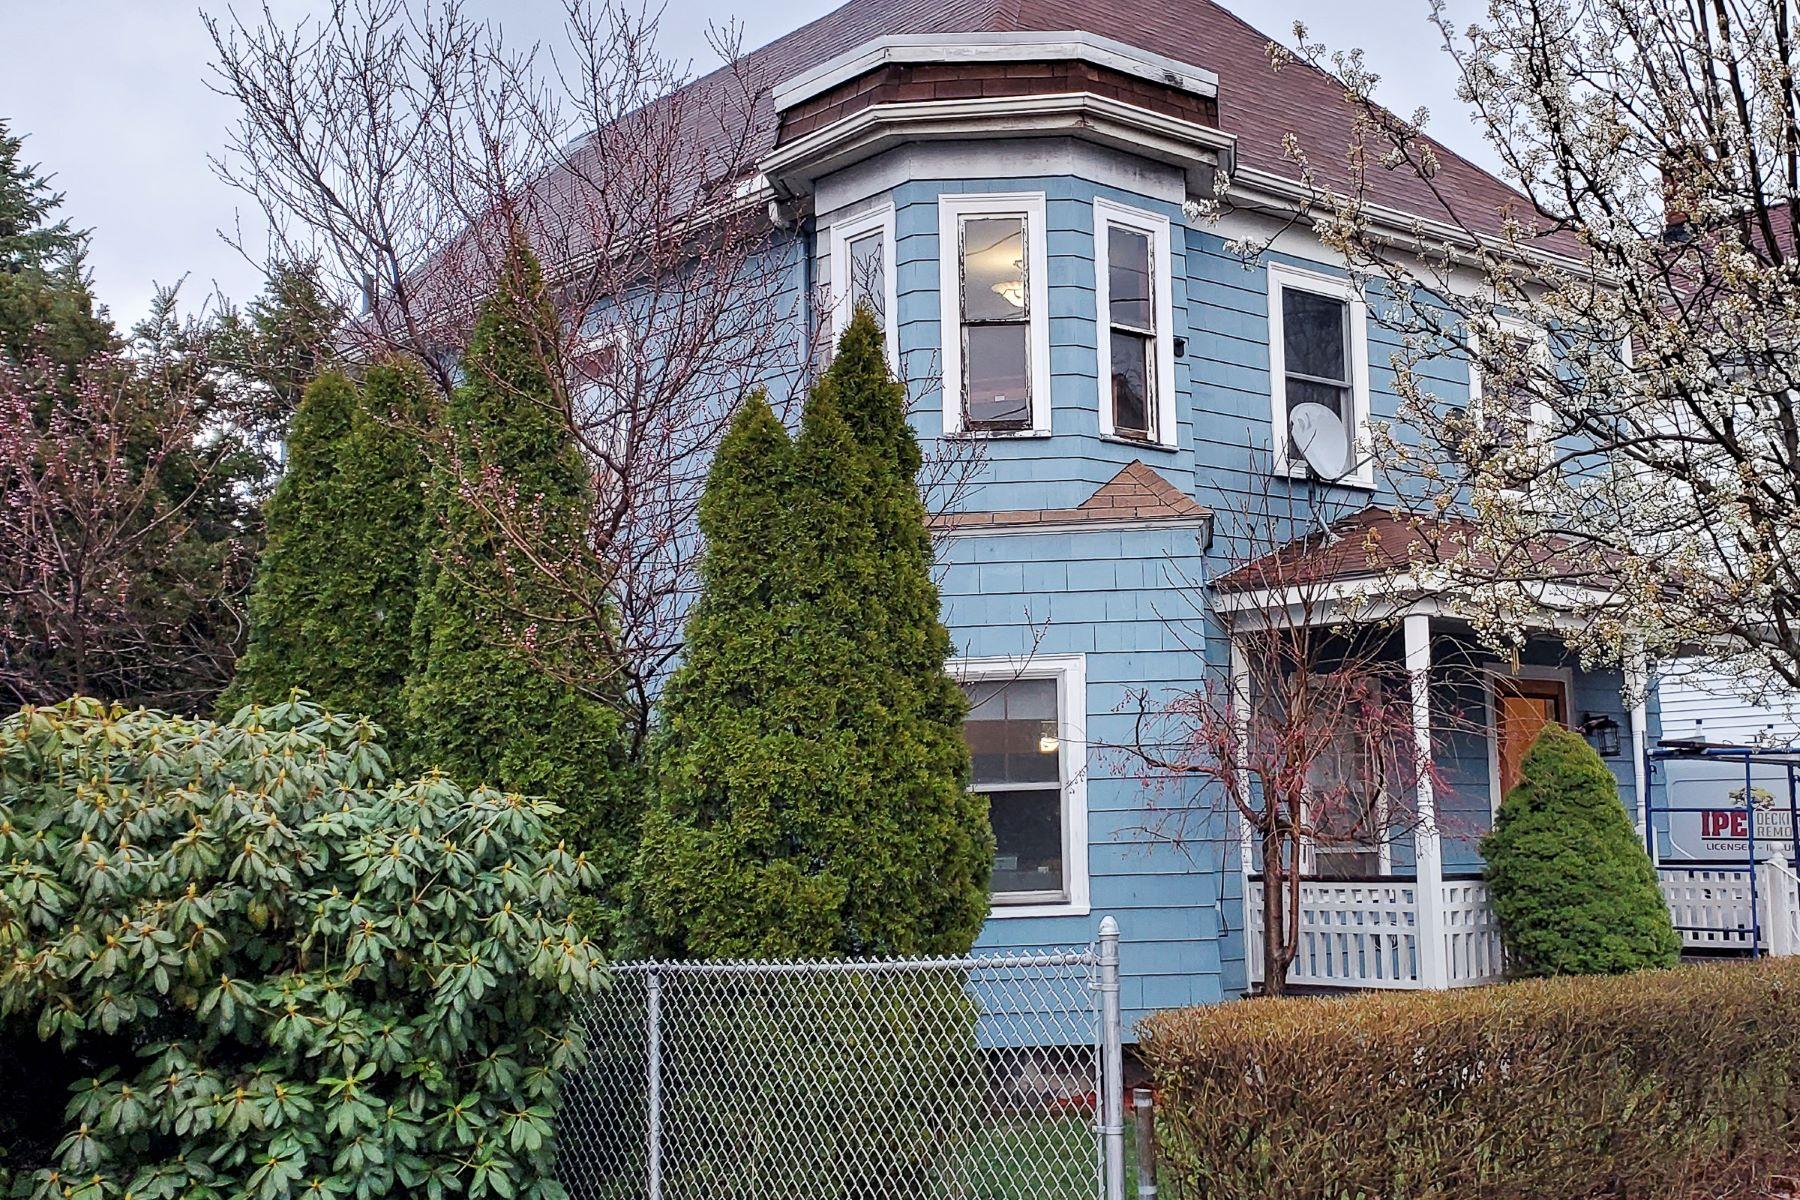 Single Family Homes για την Πώληση στο Everett, Μασαχουσετη 02149 Ηνωμένες Πολιτείες